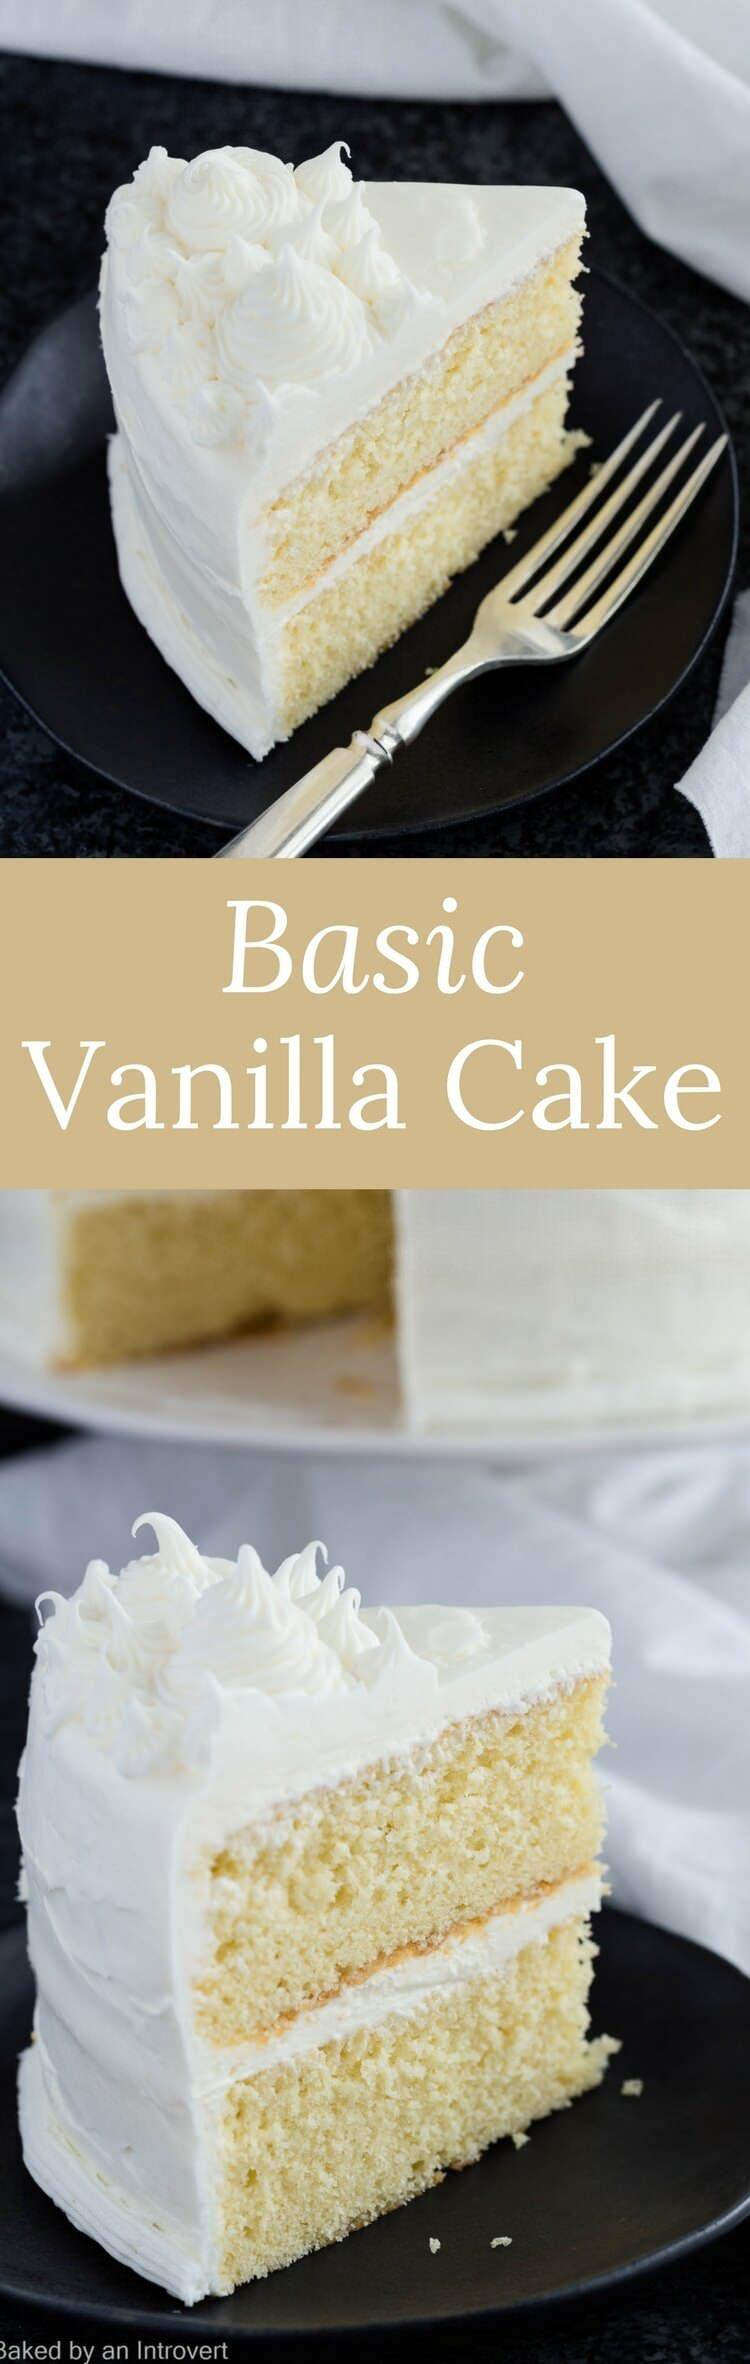 Basic Vanilla Cake Recipe   Cake   Easy   Dessert   Made from Scratch   Homemade via @introvertbaker